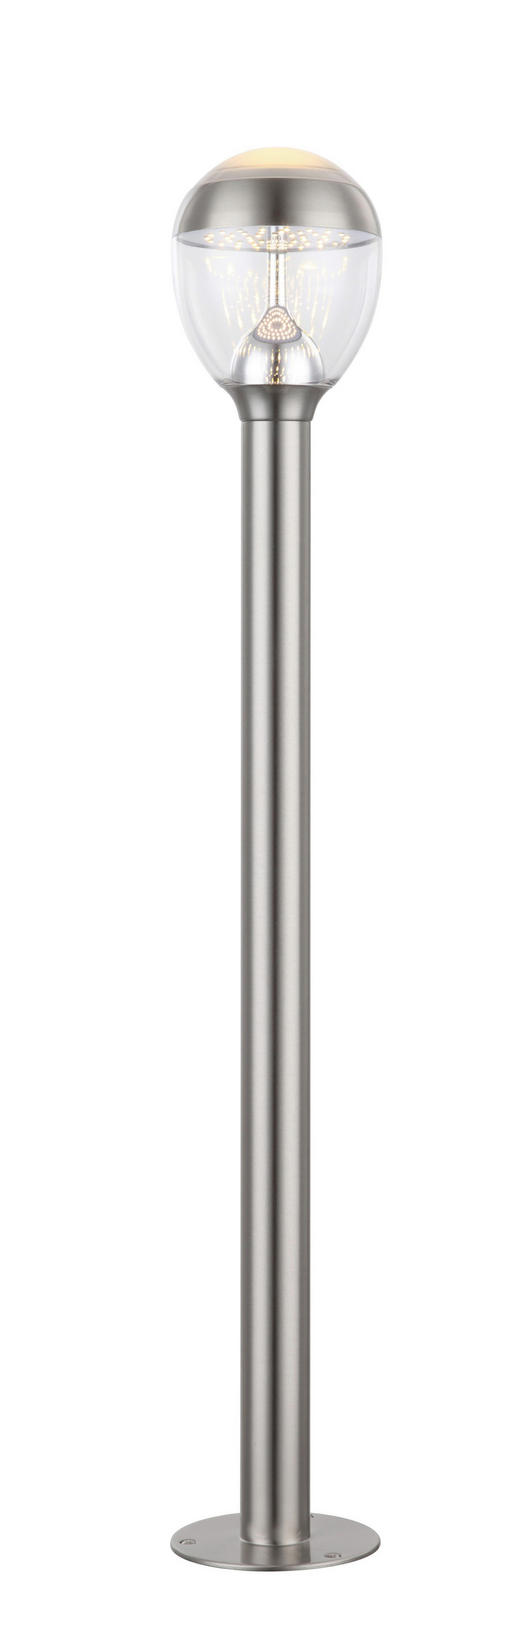 WEGELEUCHTE Dunkelgrau - Dunkelgrau, Design, Kunststoff/Metall (15/99cm)